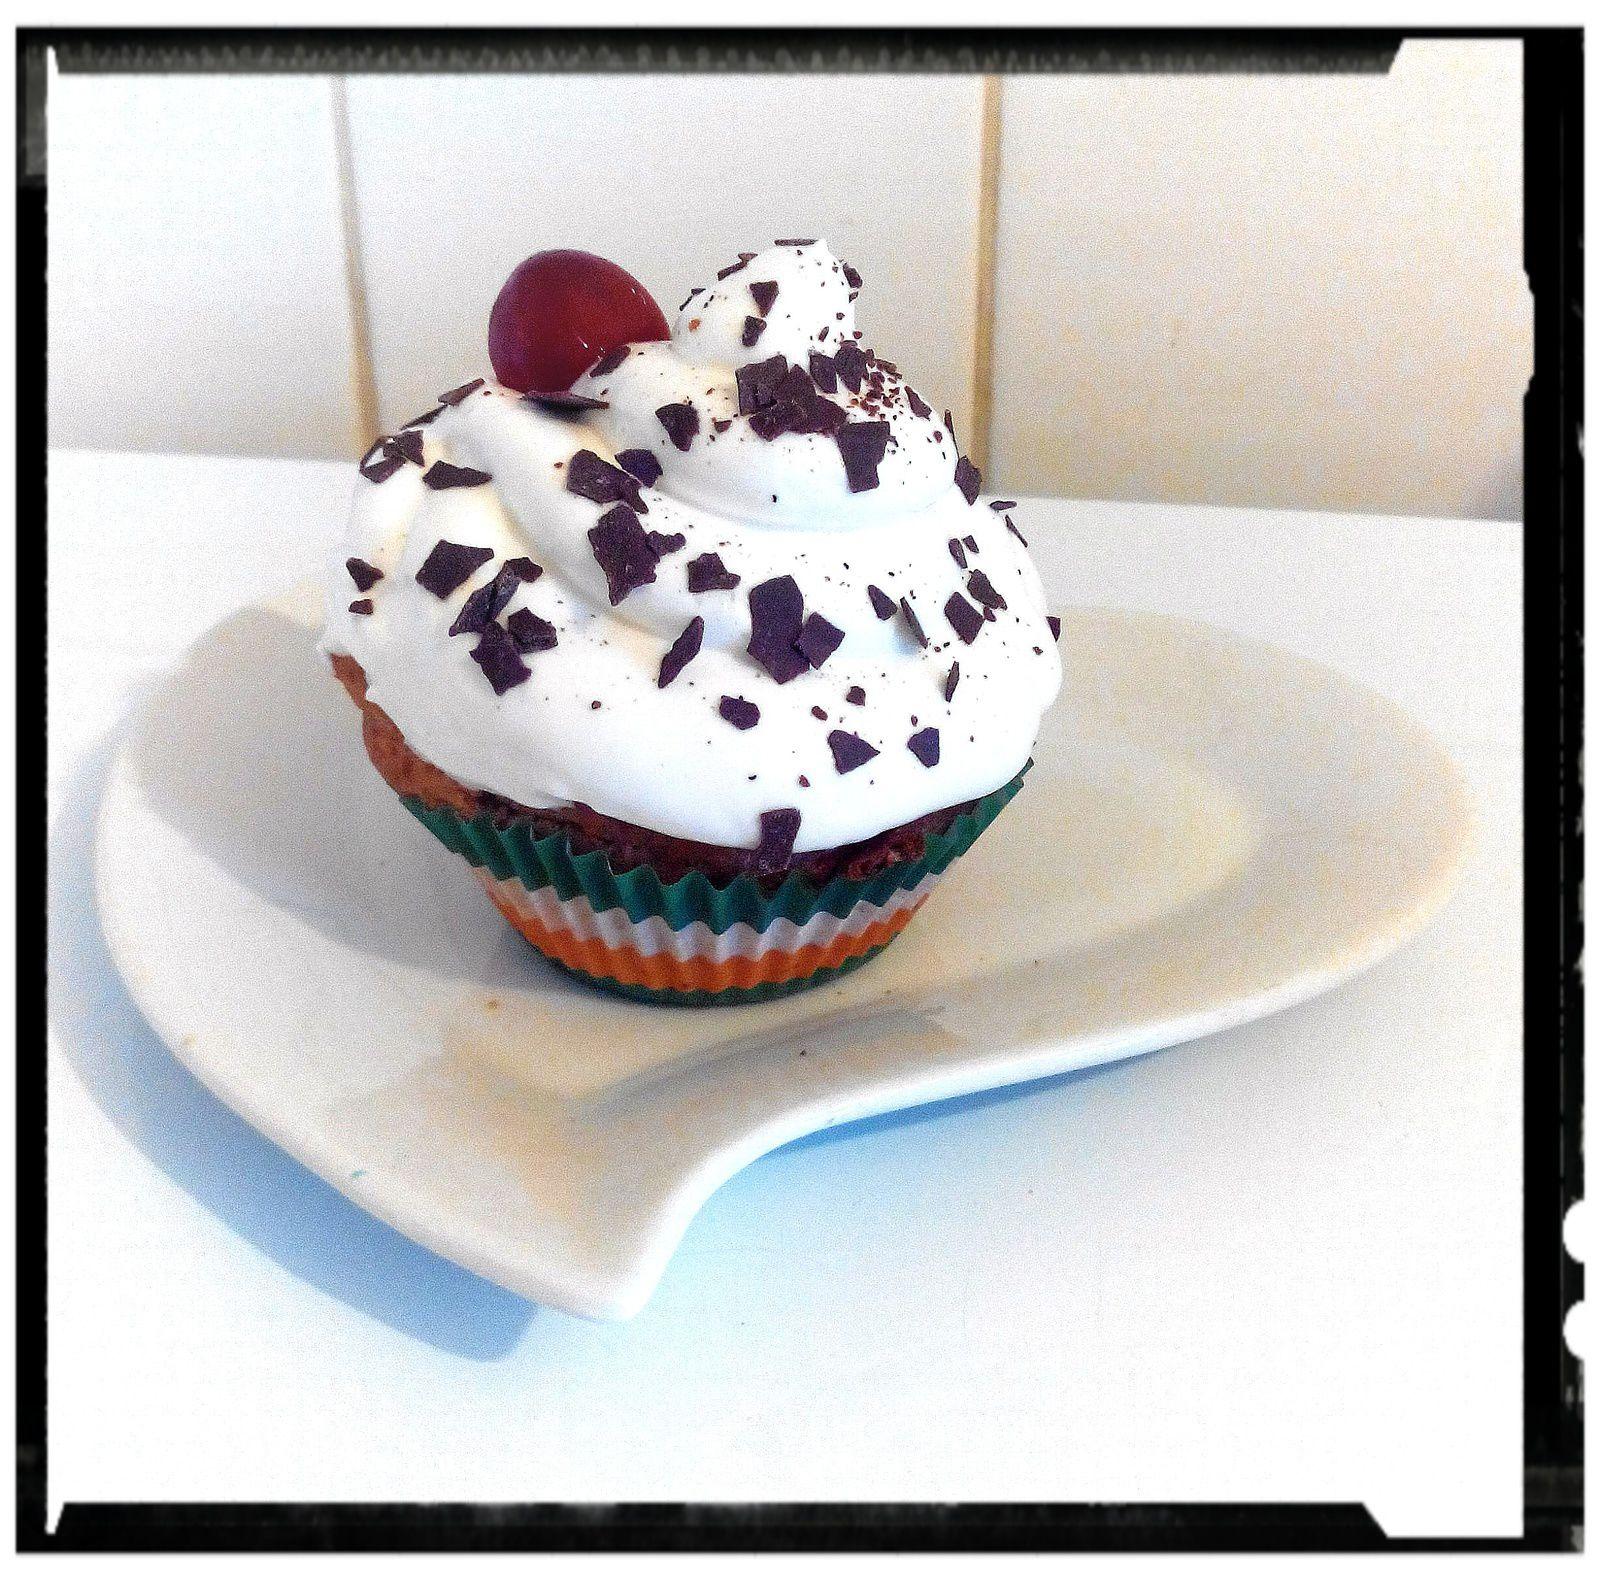 cupcakes mon chéri